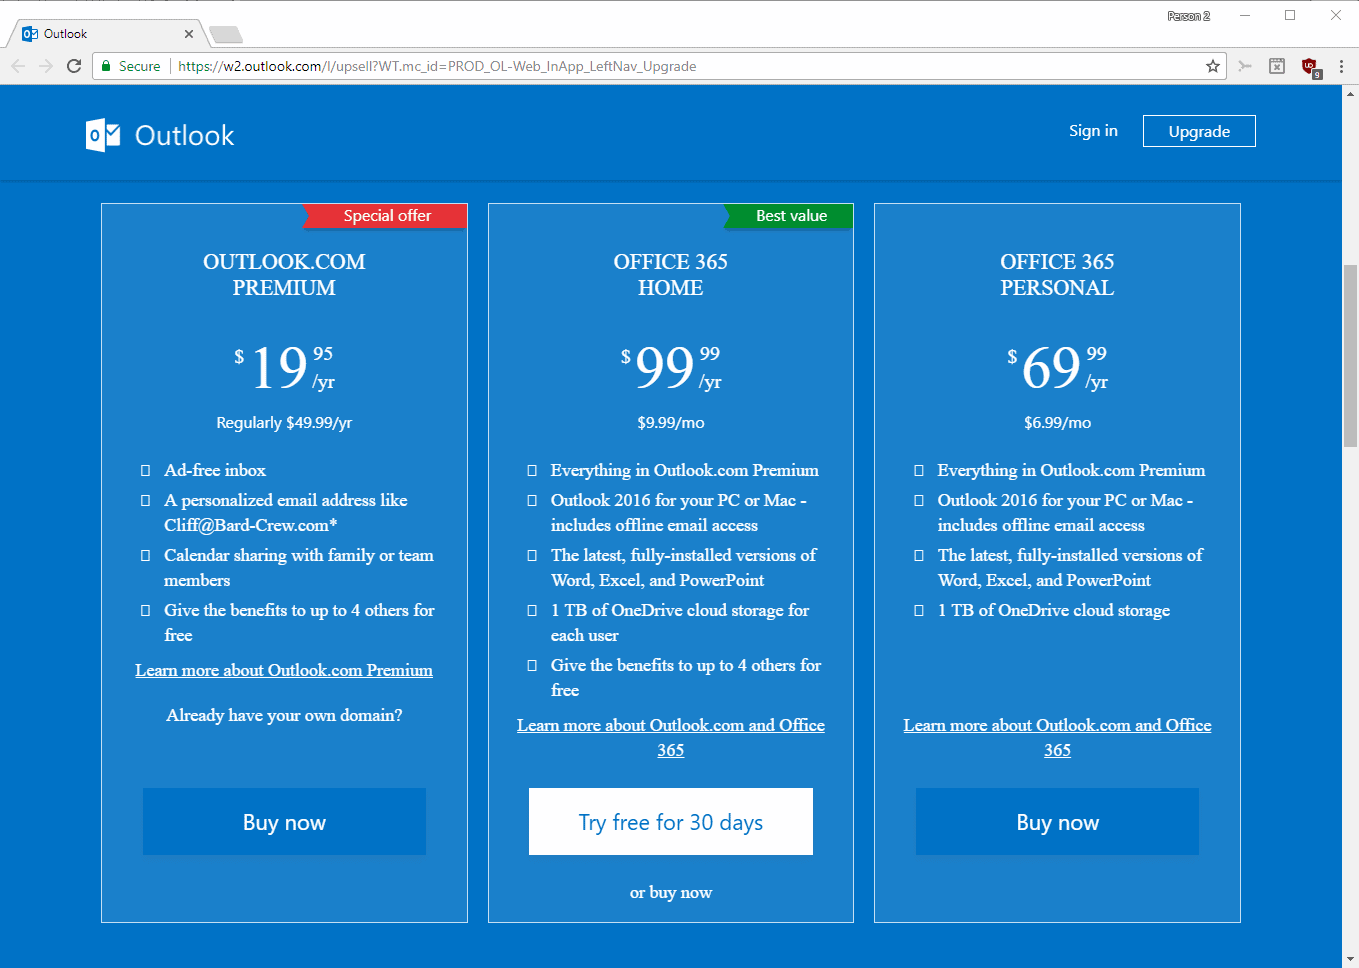 outlook.com premium office 365